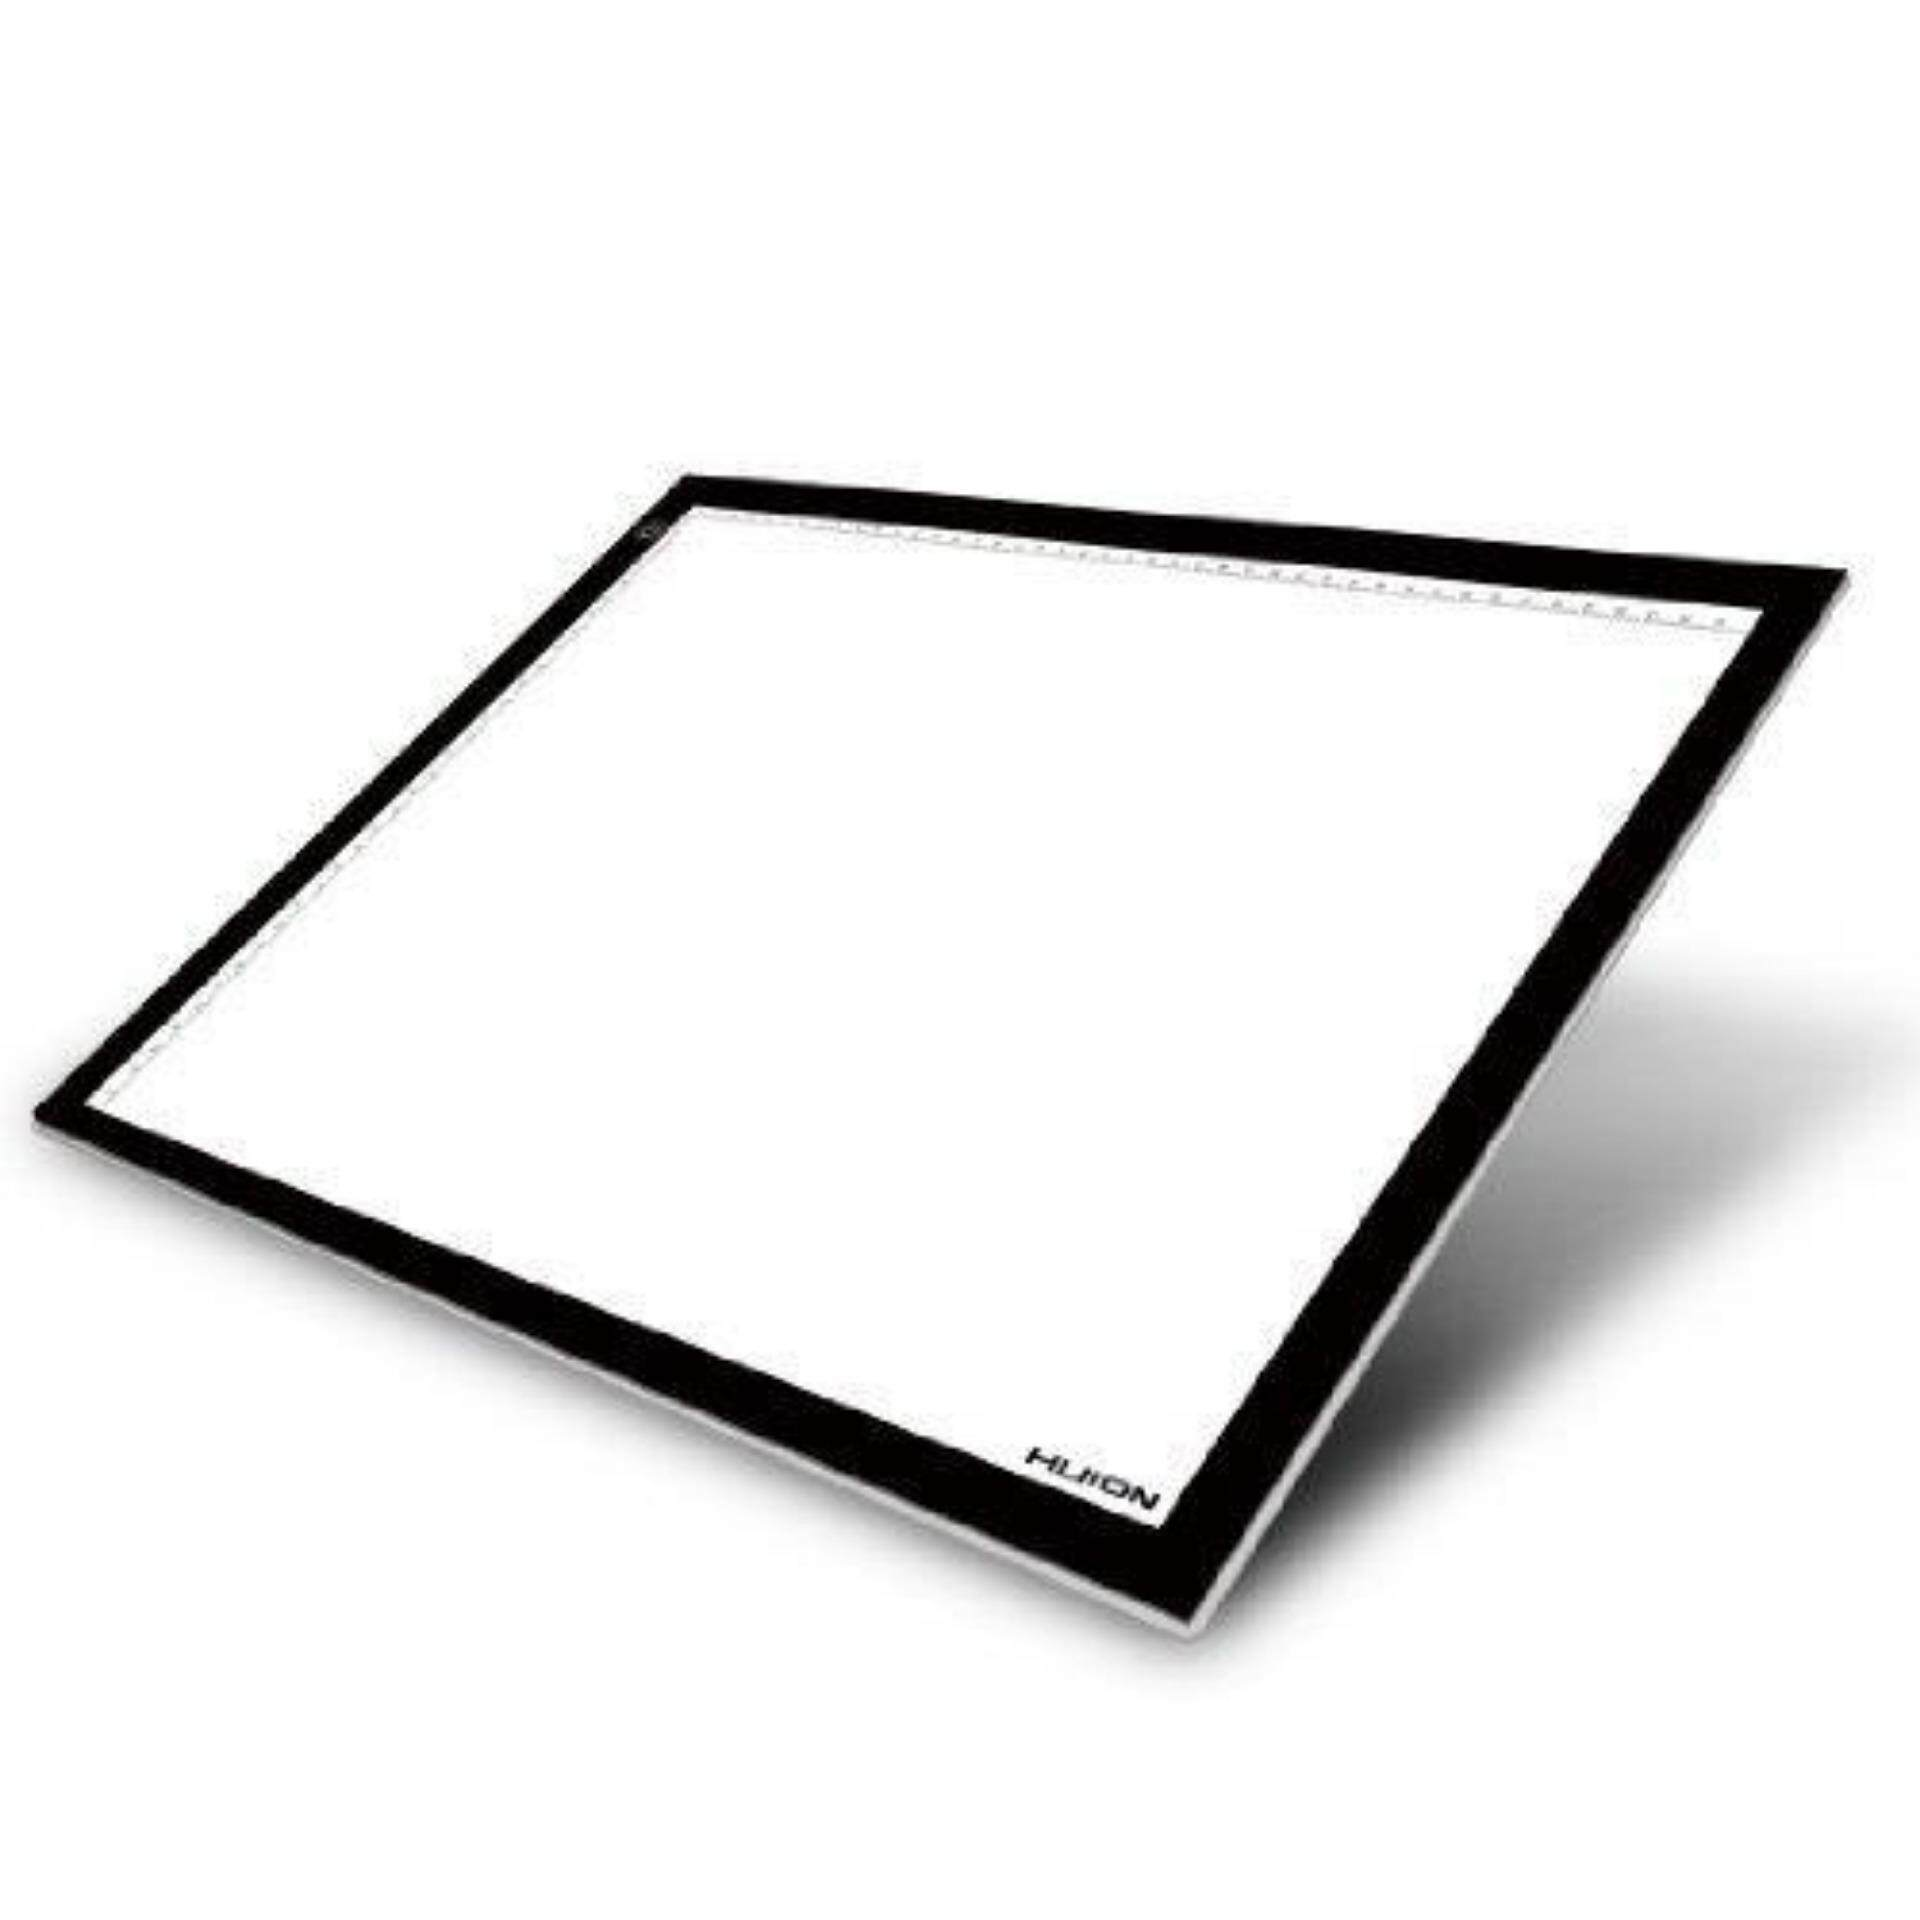 Huion A3 LED Light Pad (win & mac)